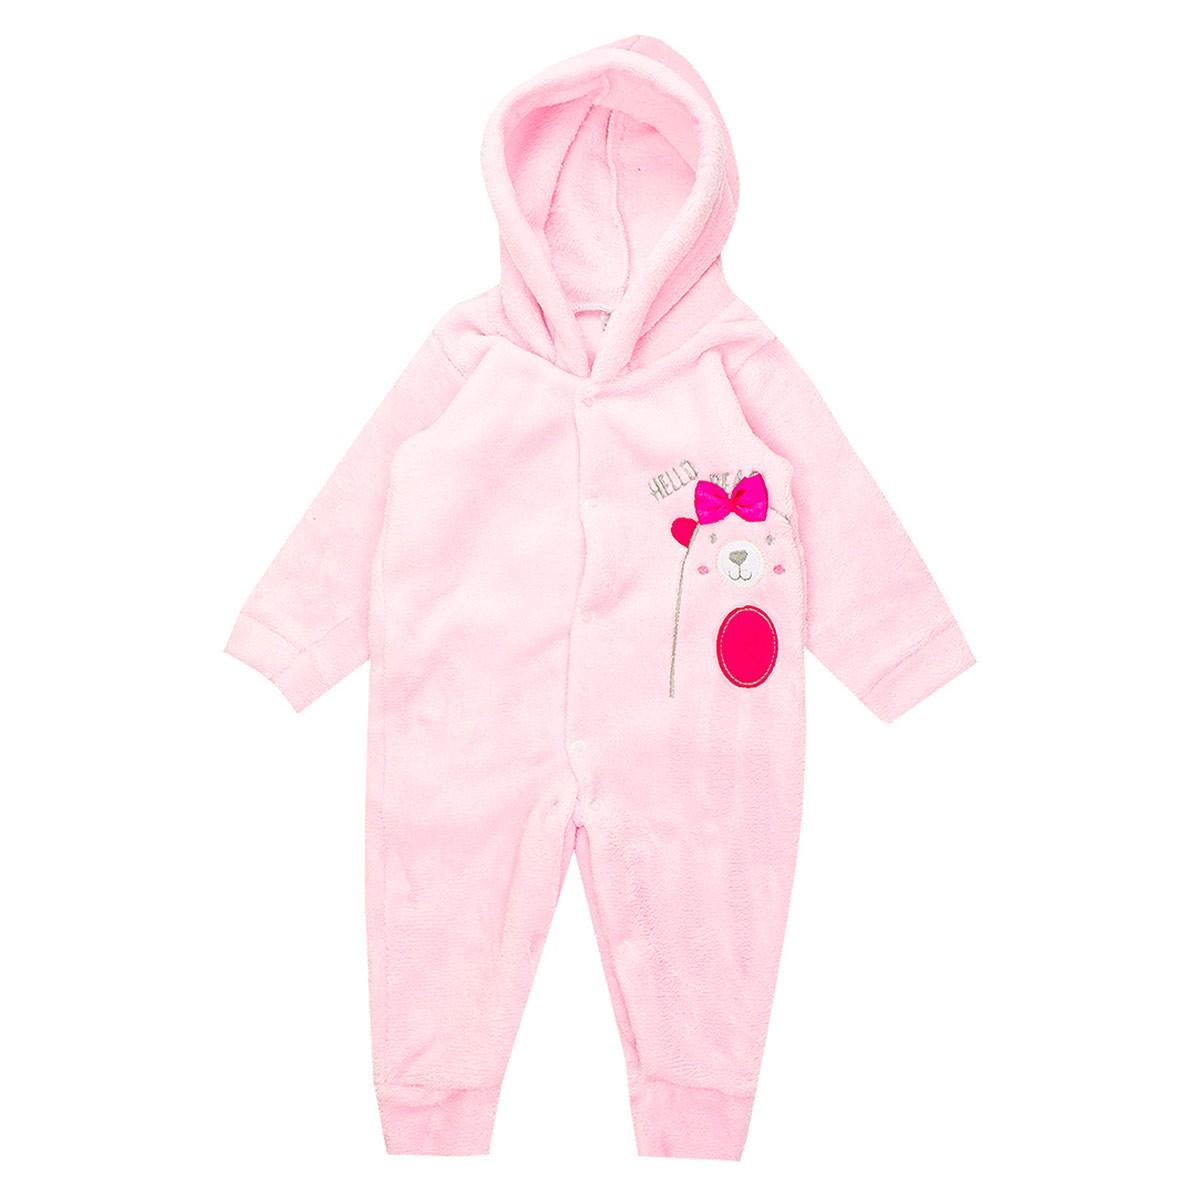 Macaquinho Bebê Menina Plush Antialérgico Rosa - Isensee